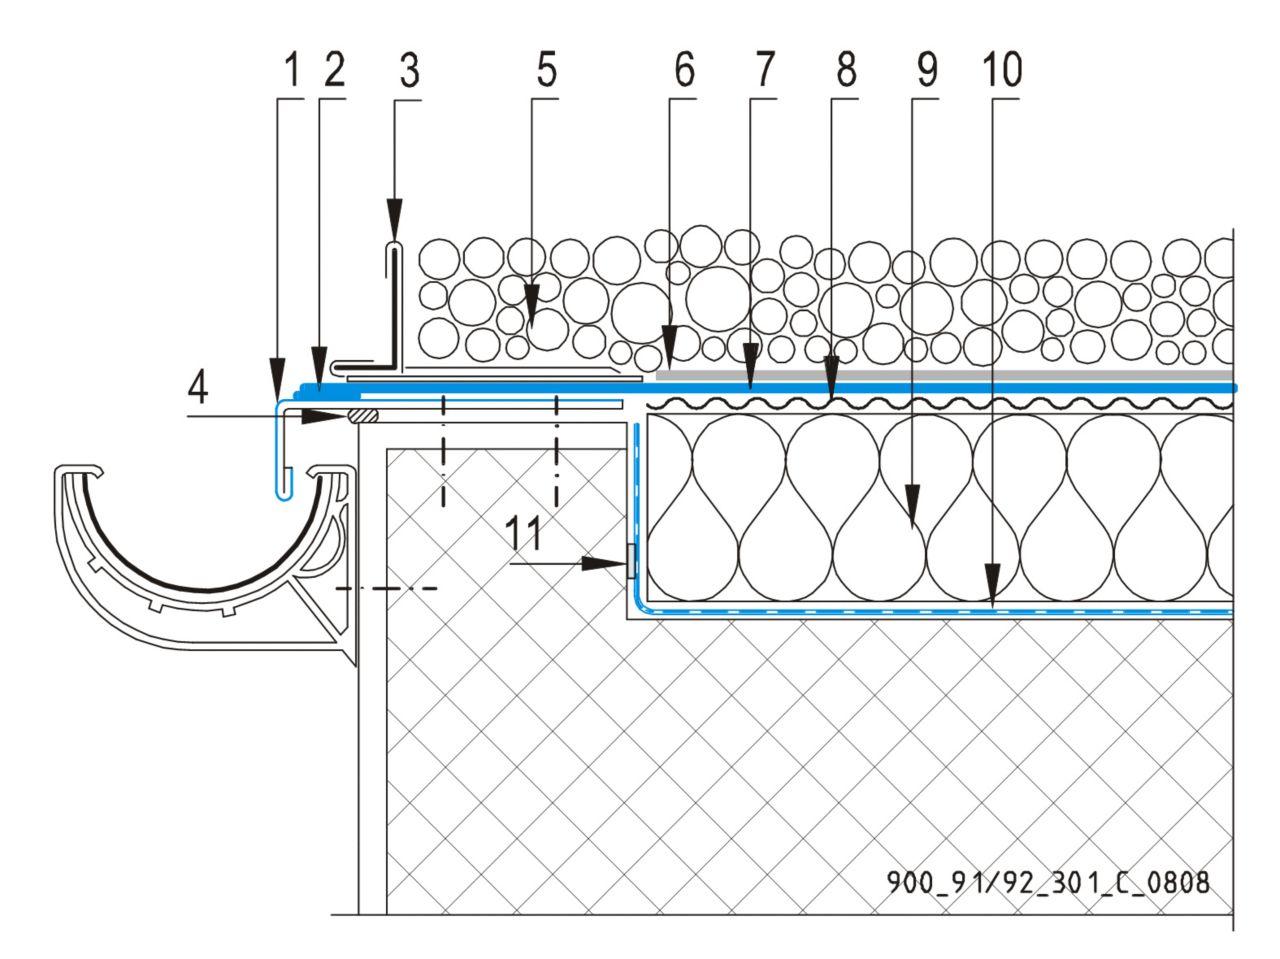 CAD Detalji - sustav balastnog krova - odvodni kanal